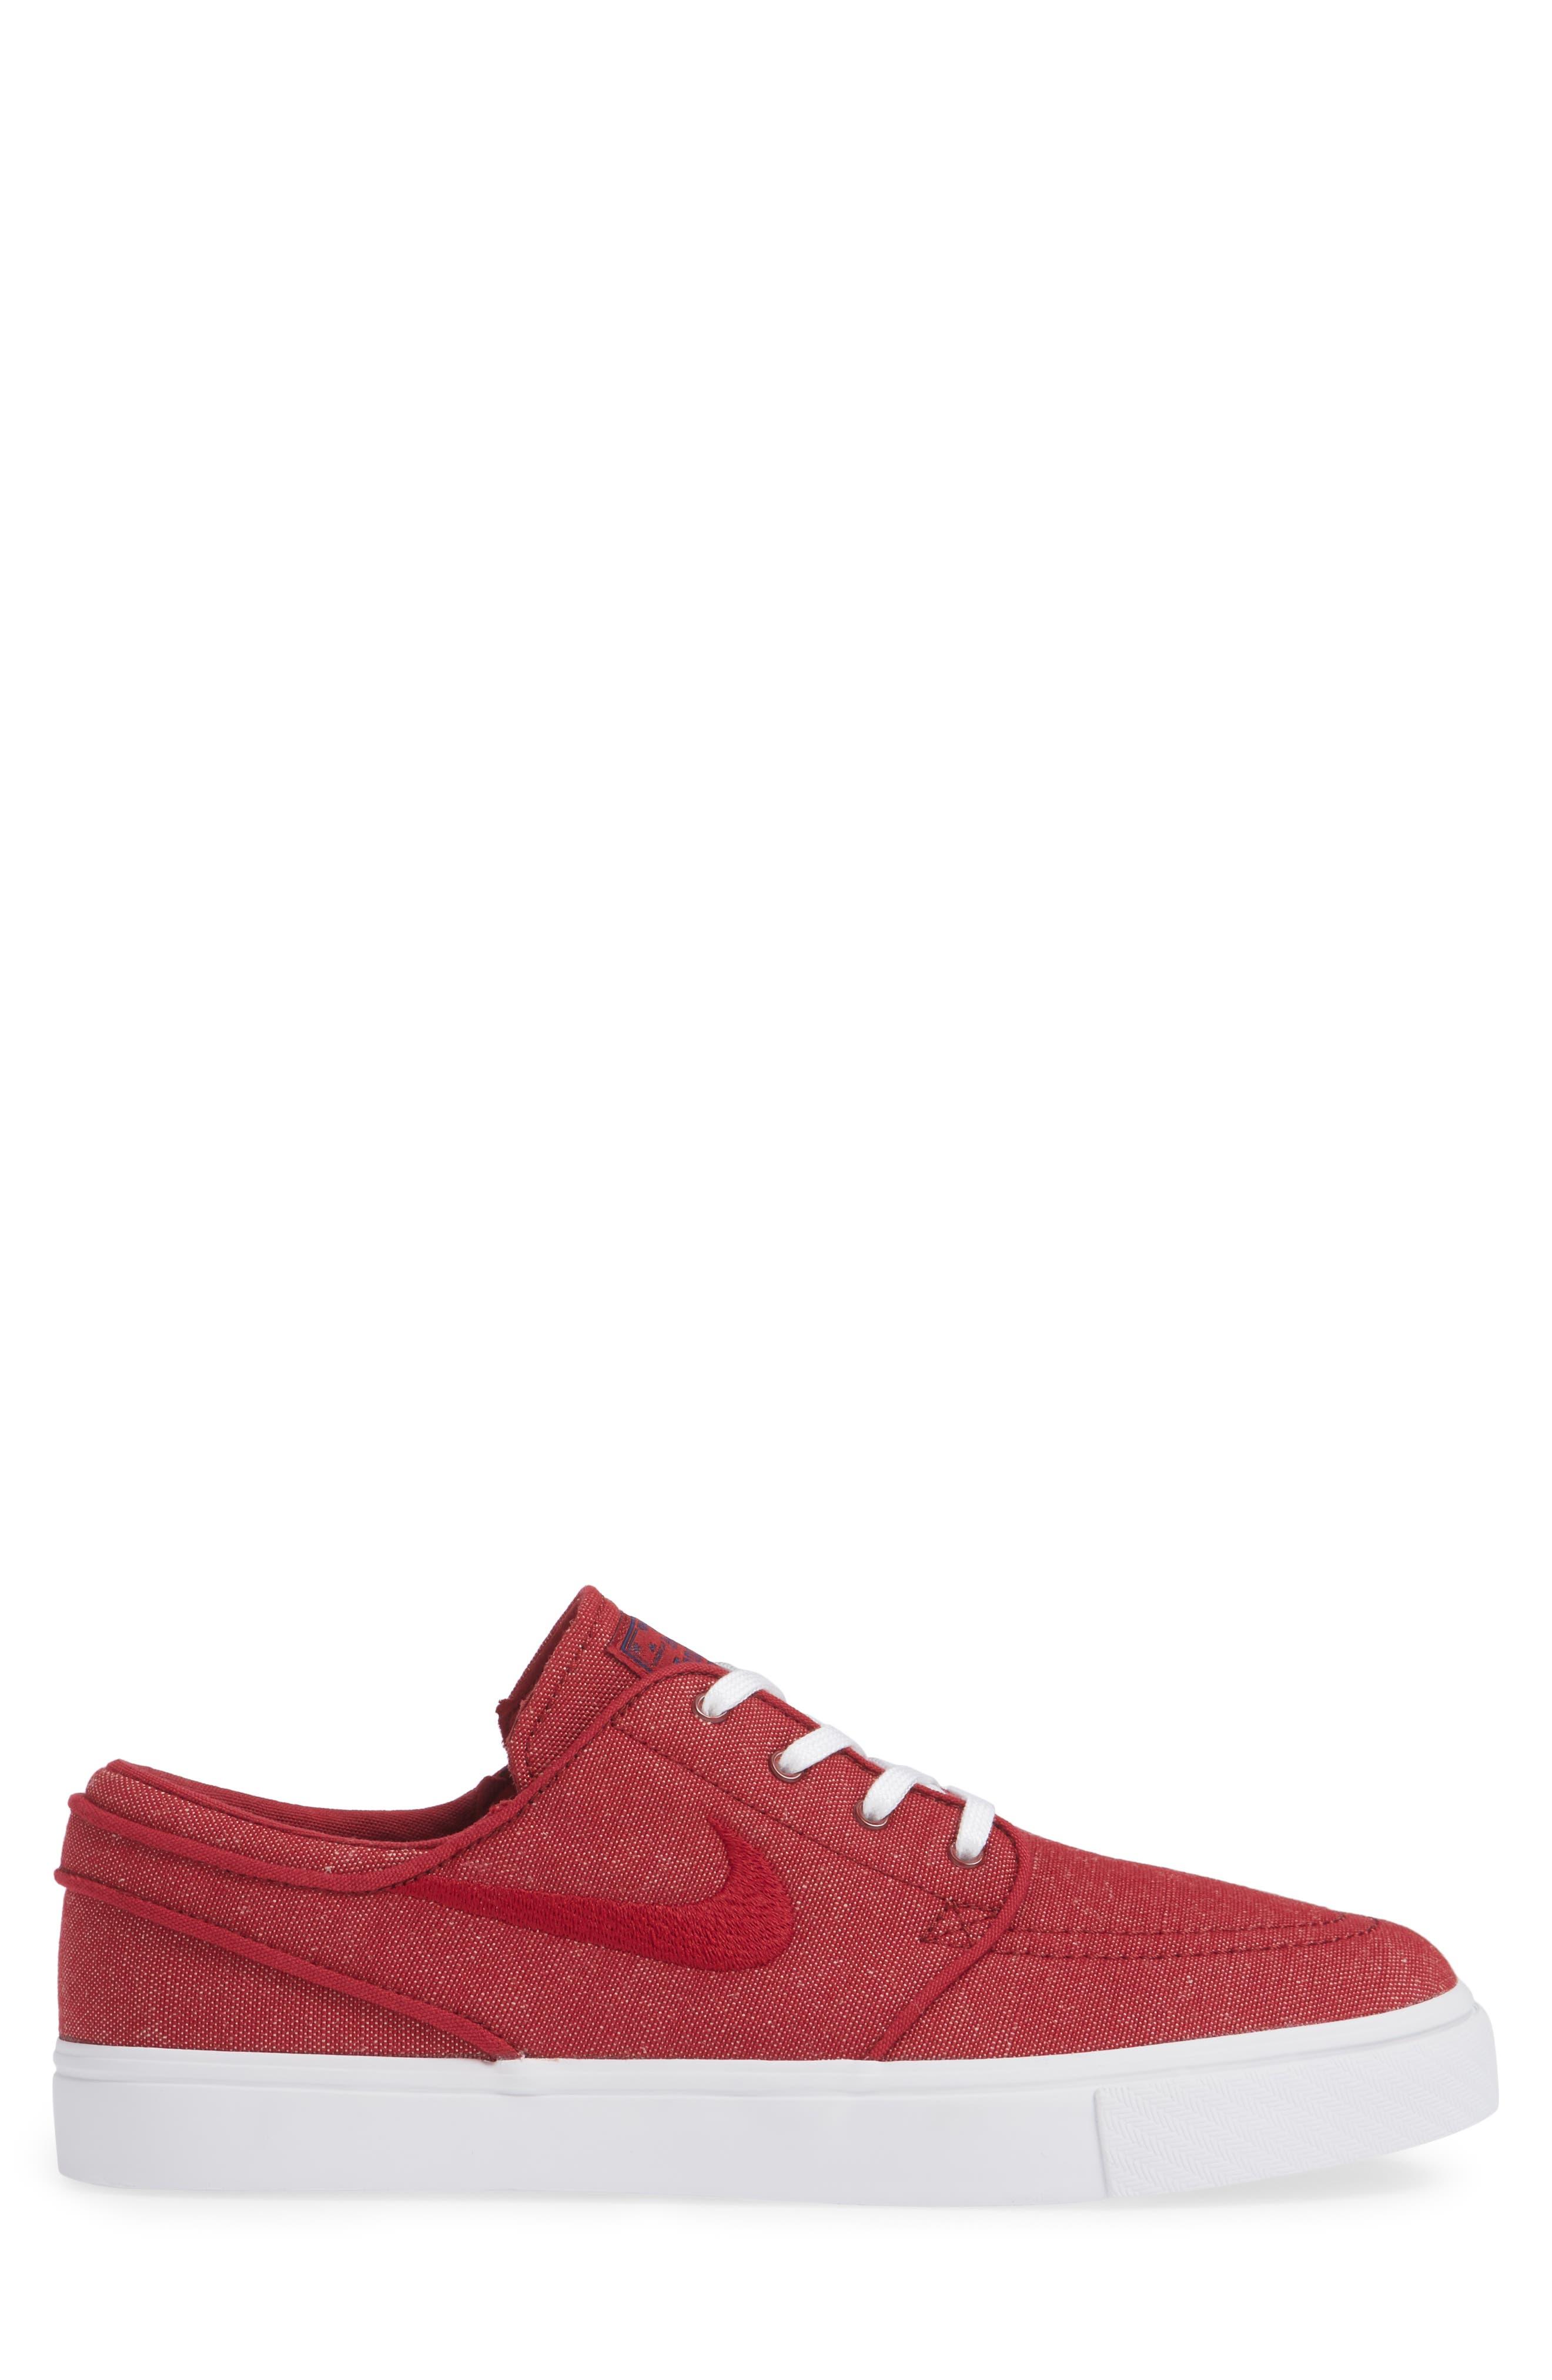 Zoom - Stefan Janoski SB Canvas Skate Shoe,                             Alternate thumbnail 132, color,